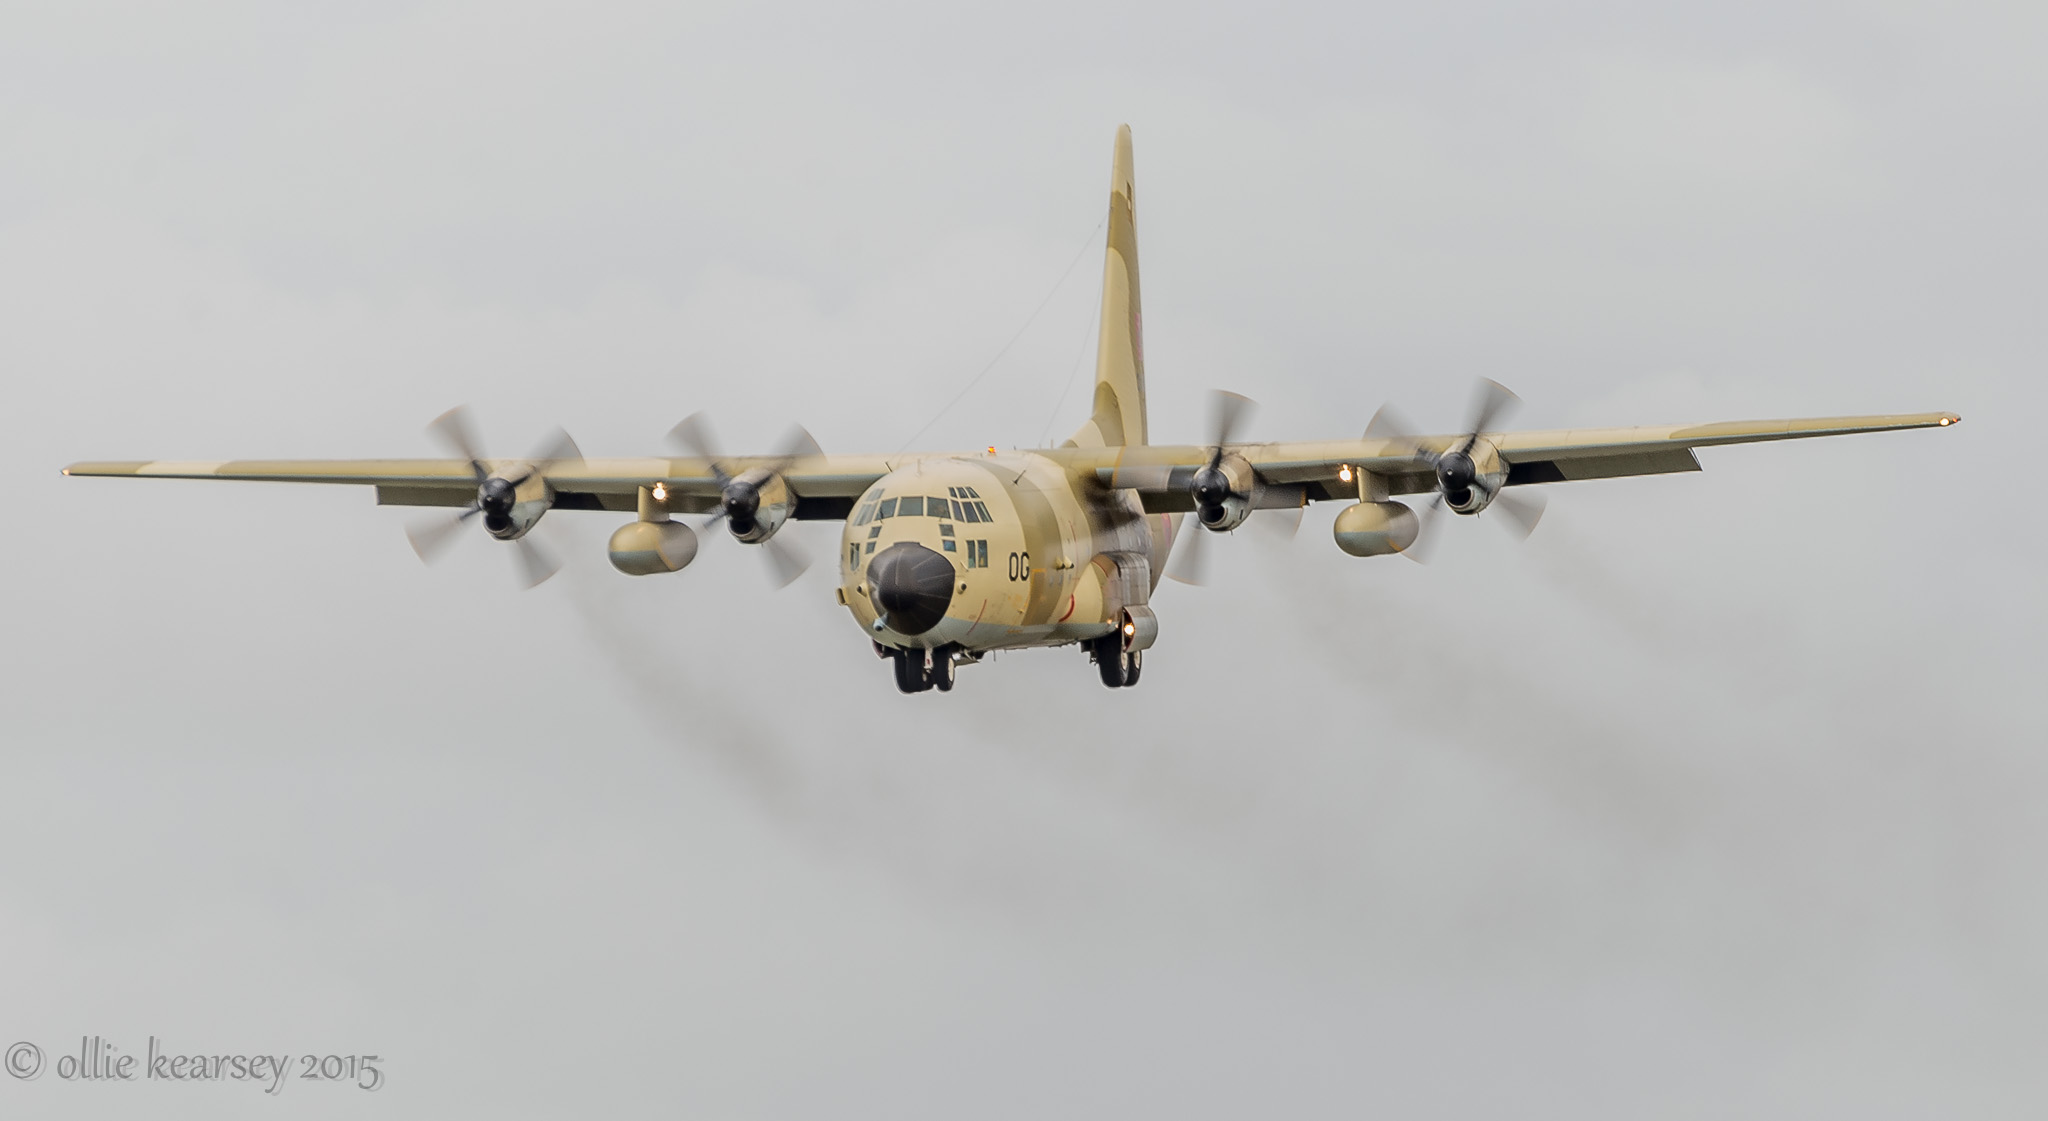 FRA: Photos d'avions de transport - Page 21 16685939622_d332f57795_o